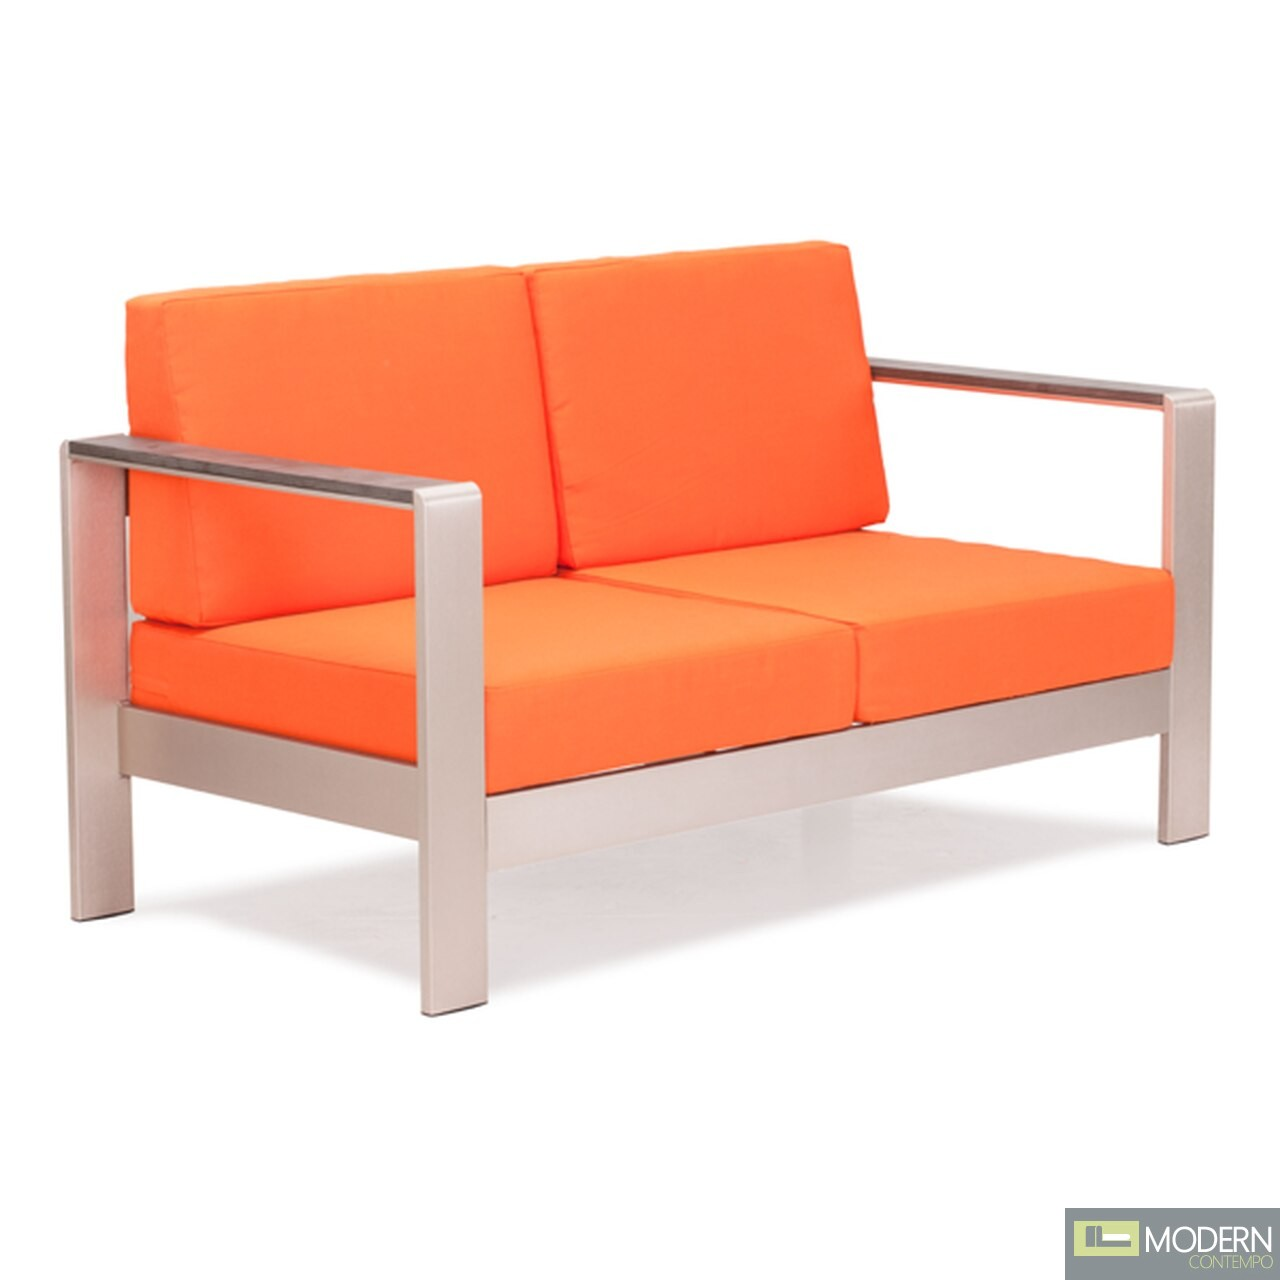 Cosmopolitan Sofa (Frame only) Brushed Aluminum